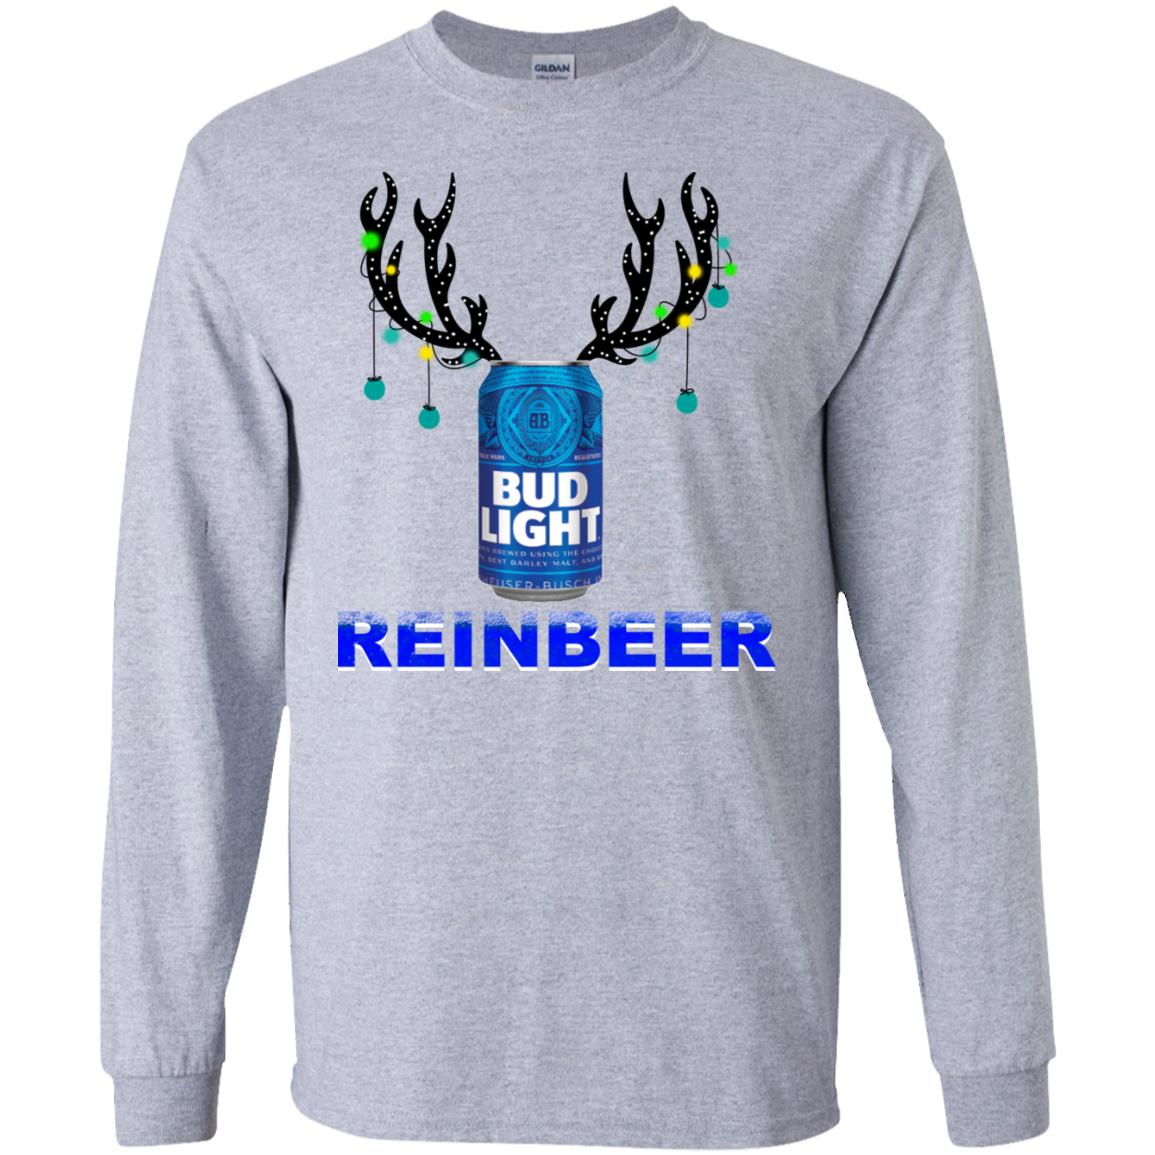 Christmas Lights Jersey: Bud Light Reinbeer Christmas Sweatshirt, Hoodie, Long